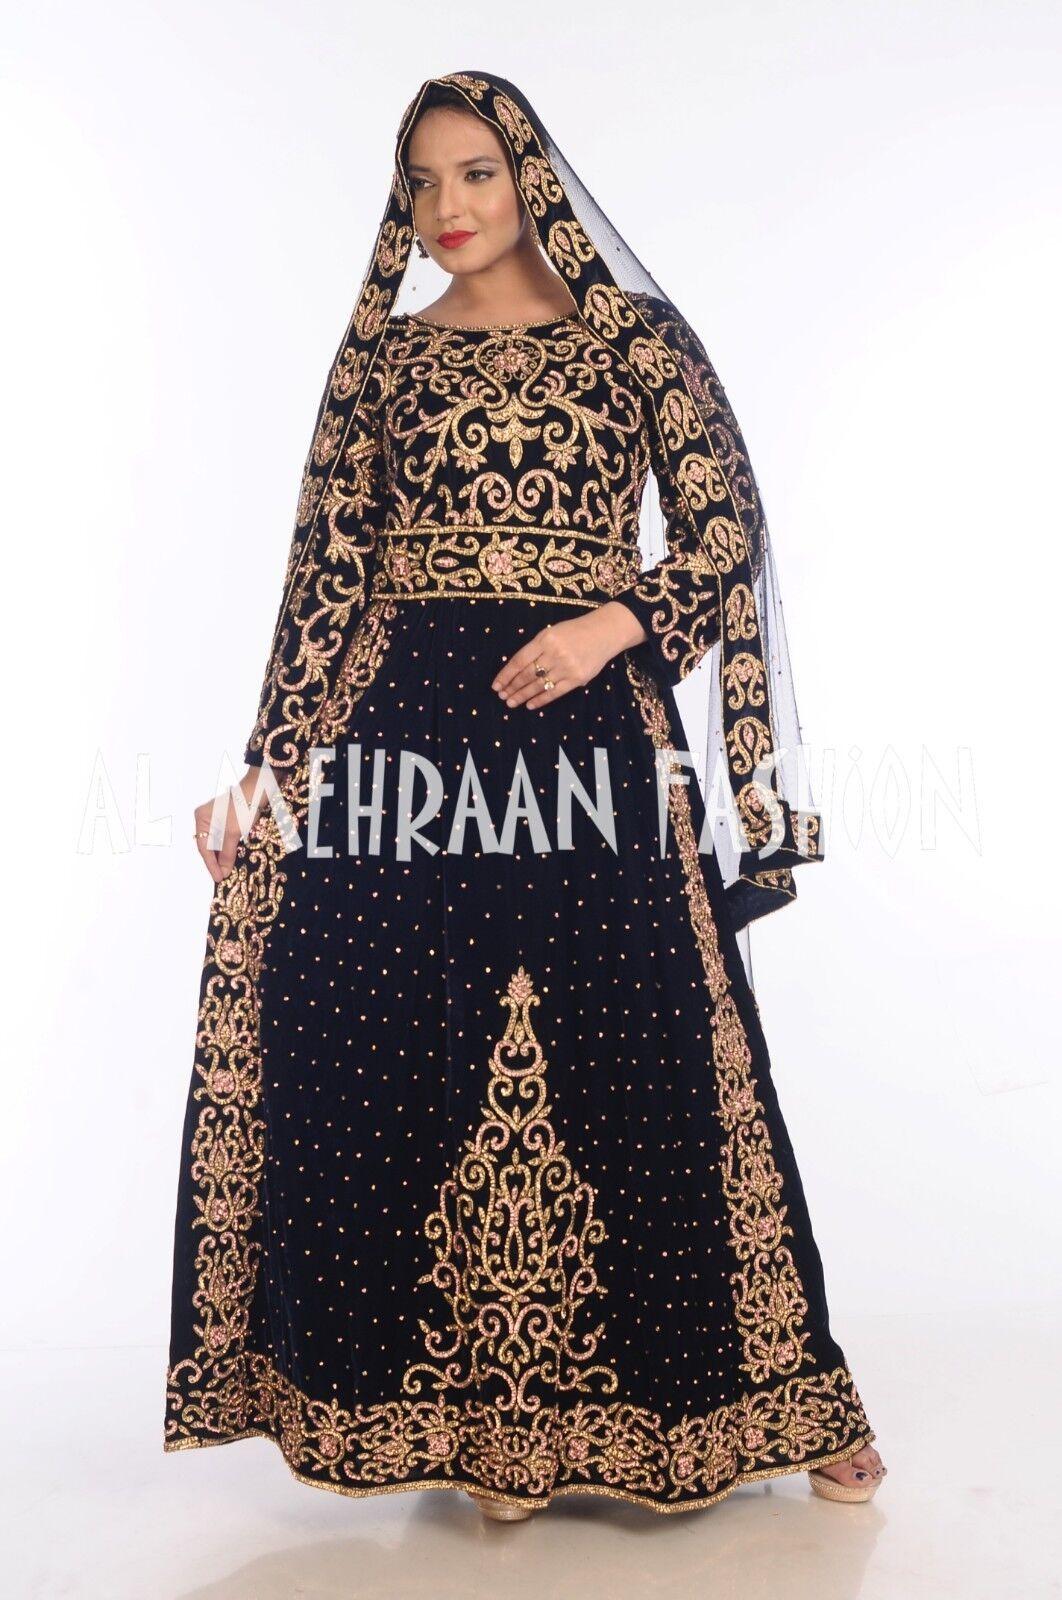 ROYAL ETHNIC WOMEN MAXI LONG SLEEVE ISLAMIC KAFTAN DRESS DRESS DRESS FROM AL MEHRAAN FASHION 5e51fe